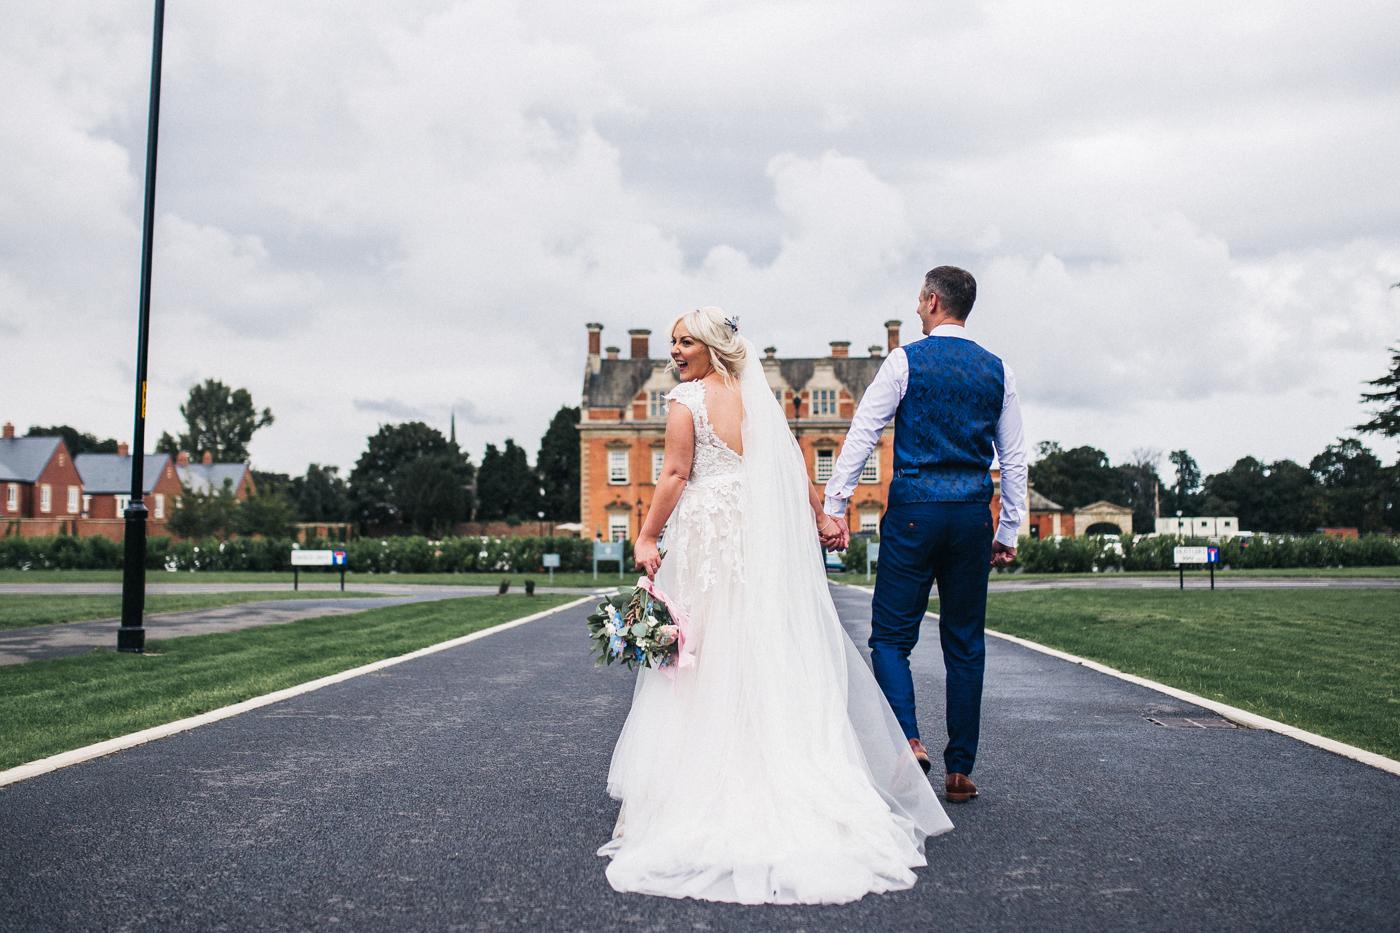 teesside-middlesbrough-north-east-wedding-photographer-creative-wedding-venues-0051.jpg